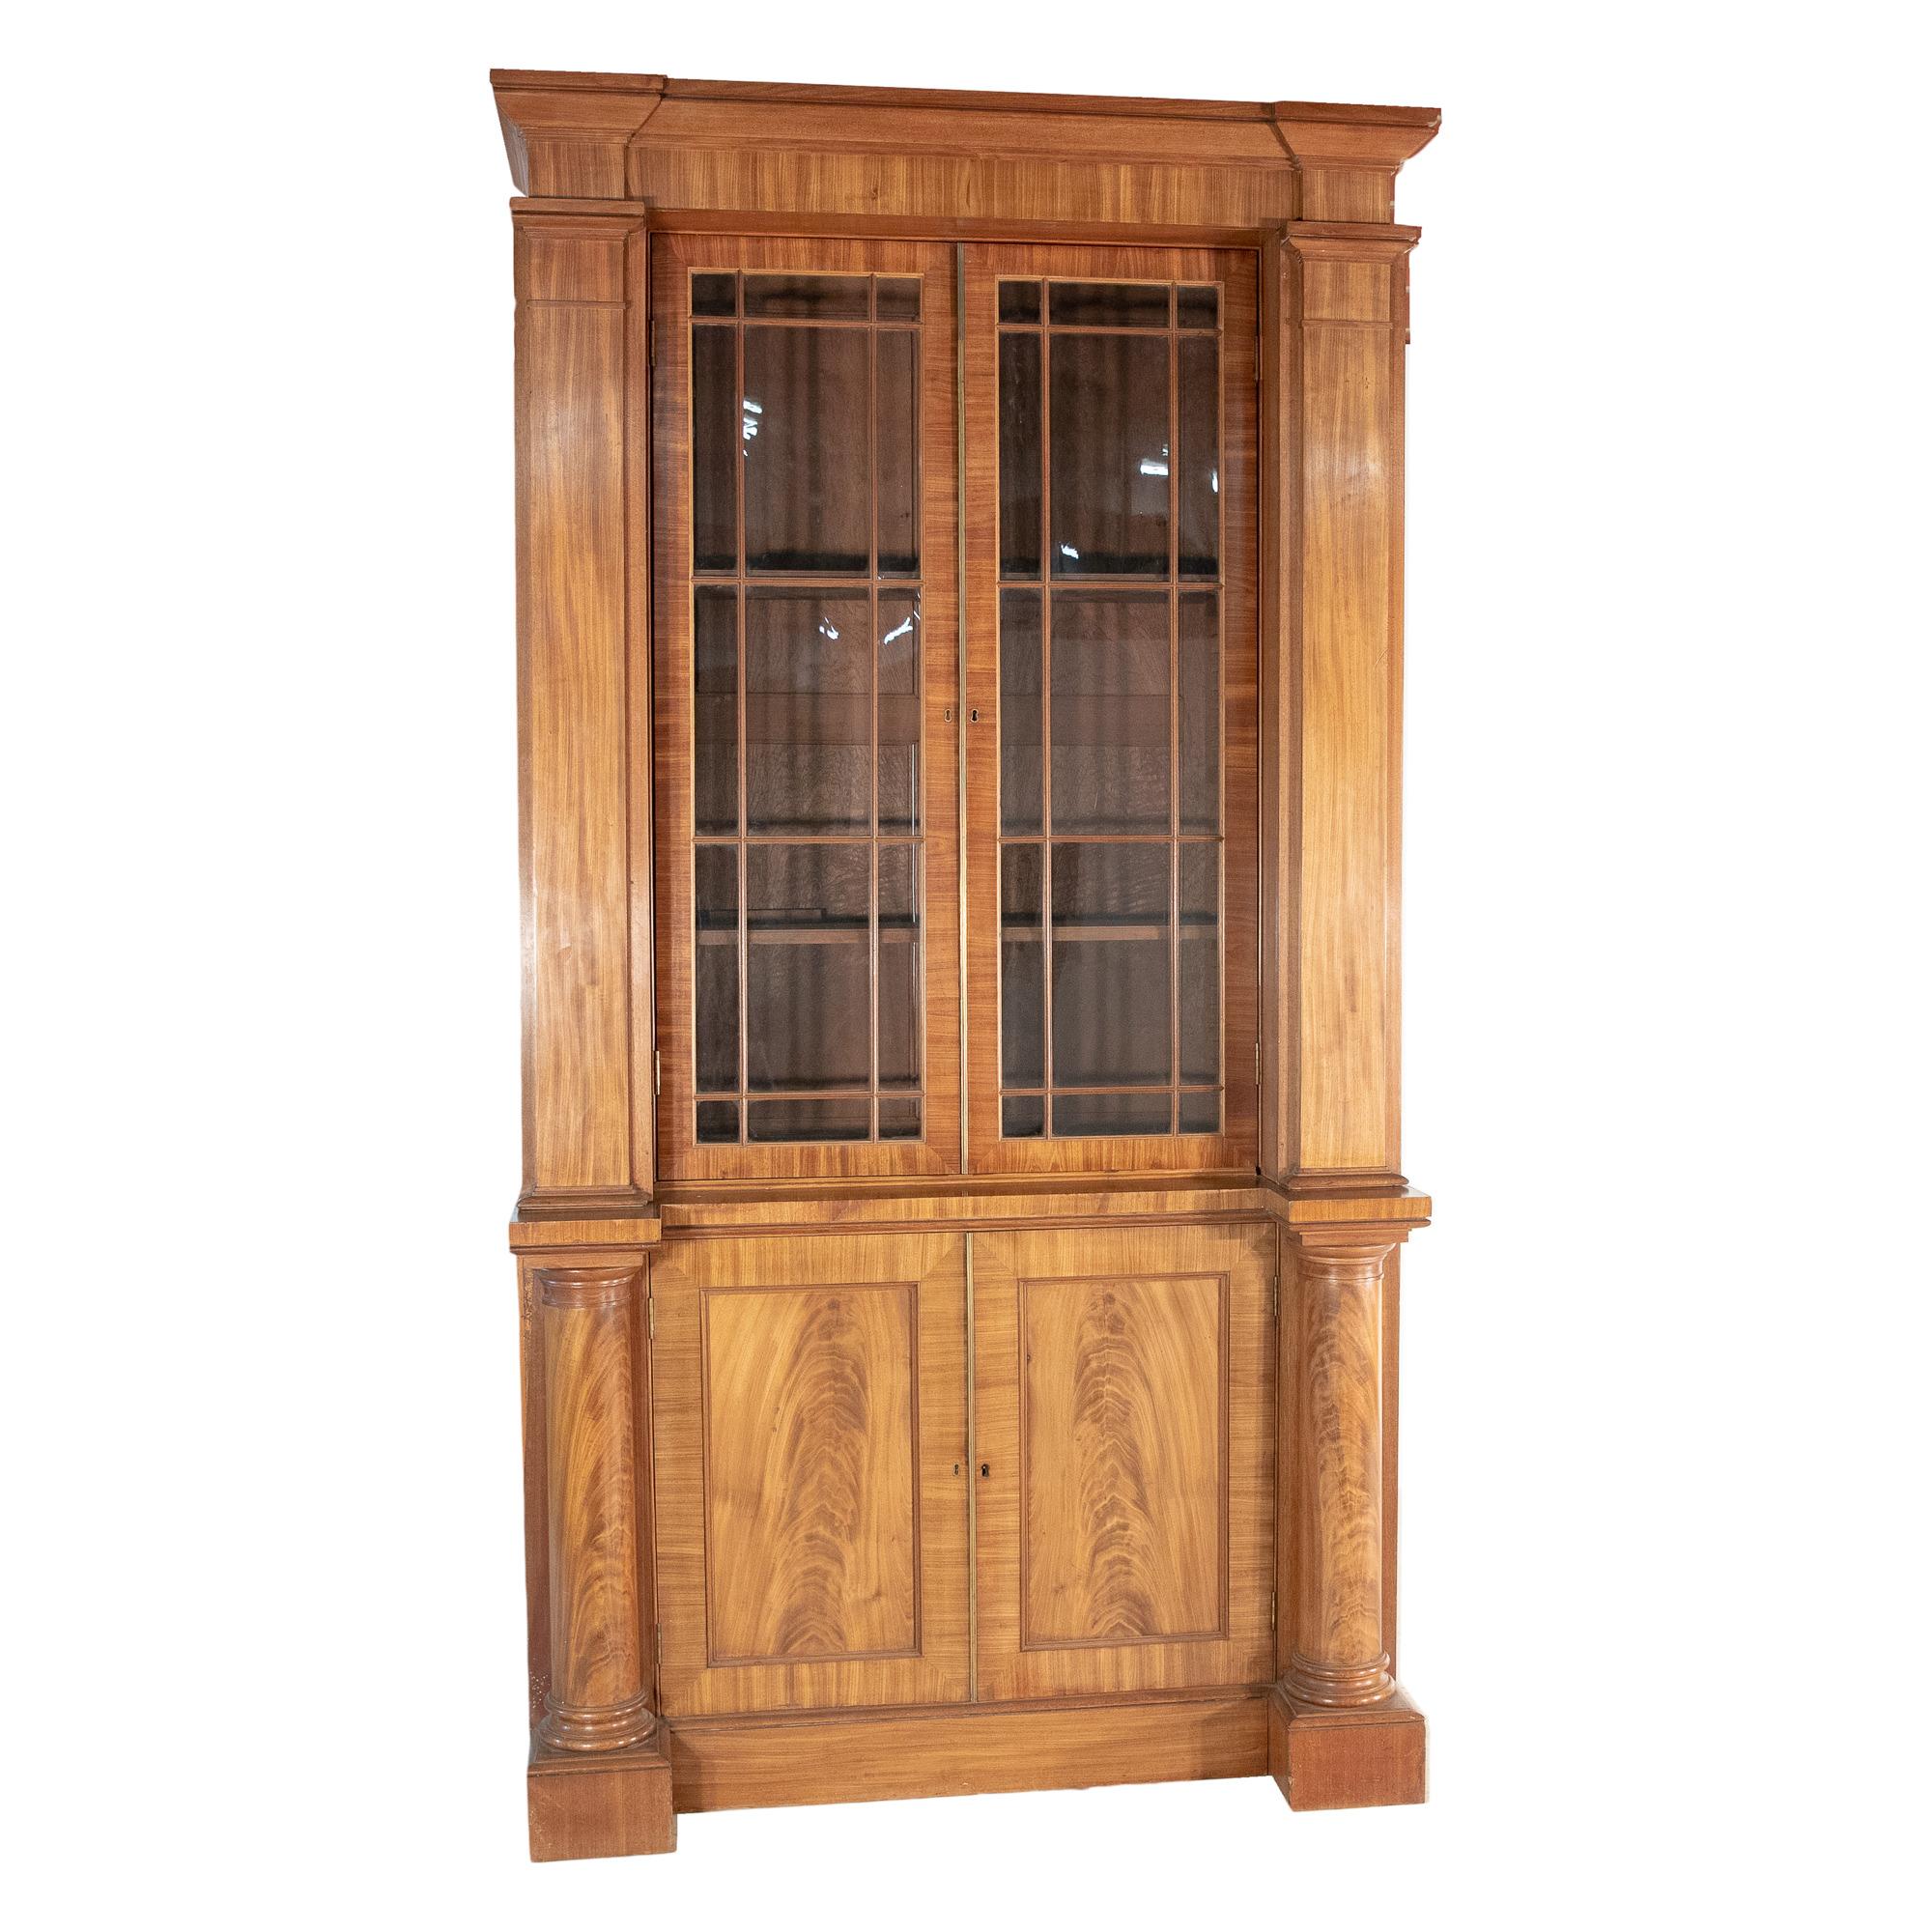 'William IV Pale Mahogany Astragal Glazed Bookcase of Architectual Form Circa 1835'